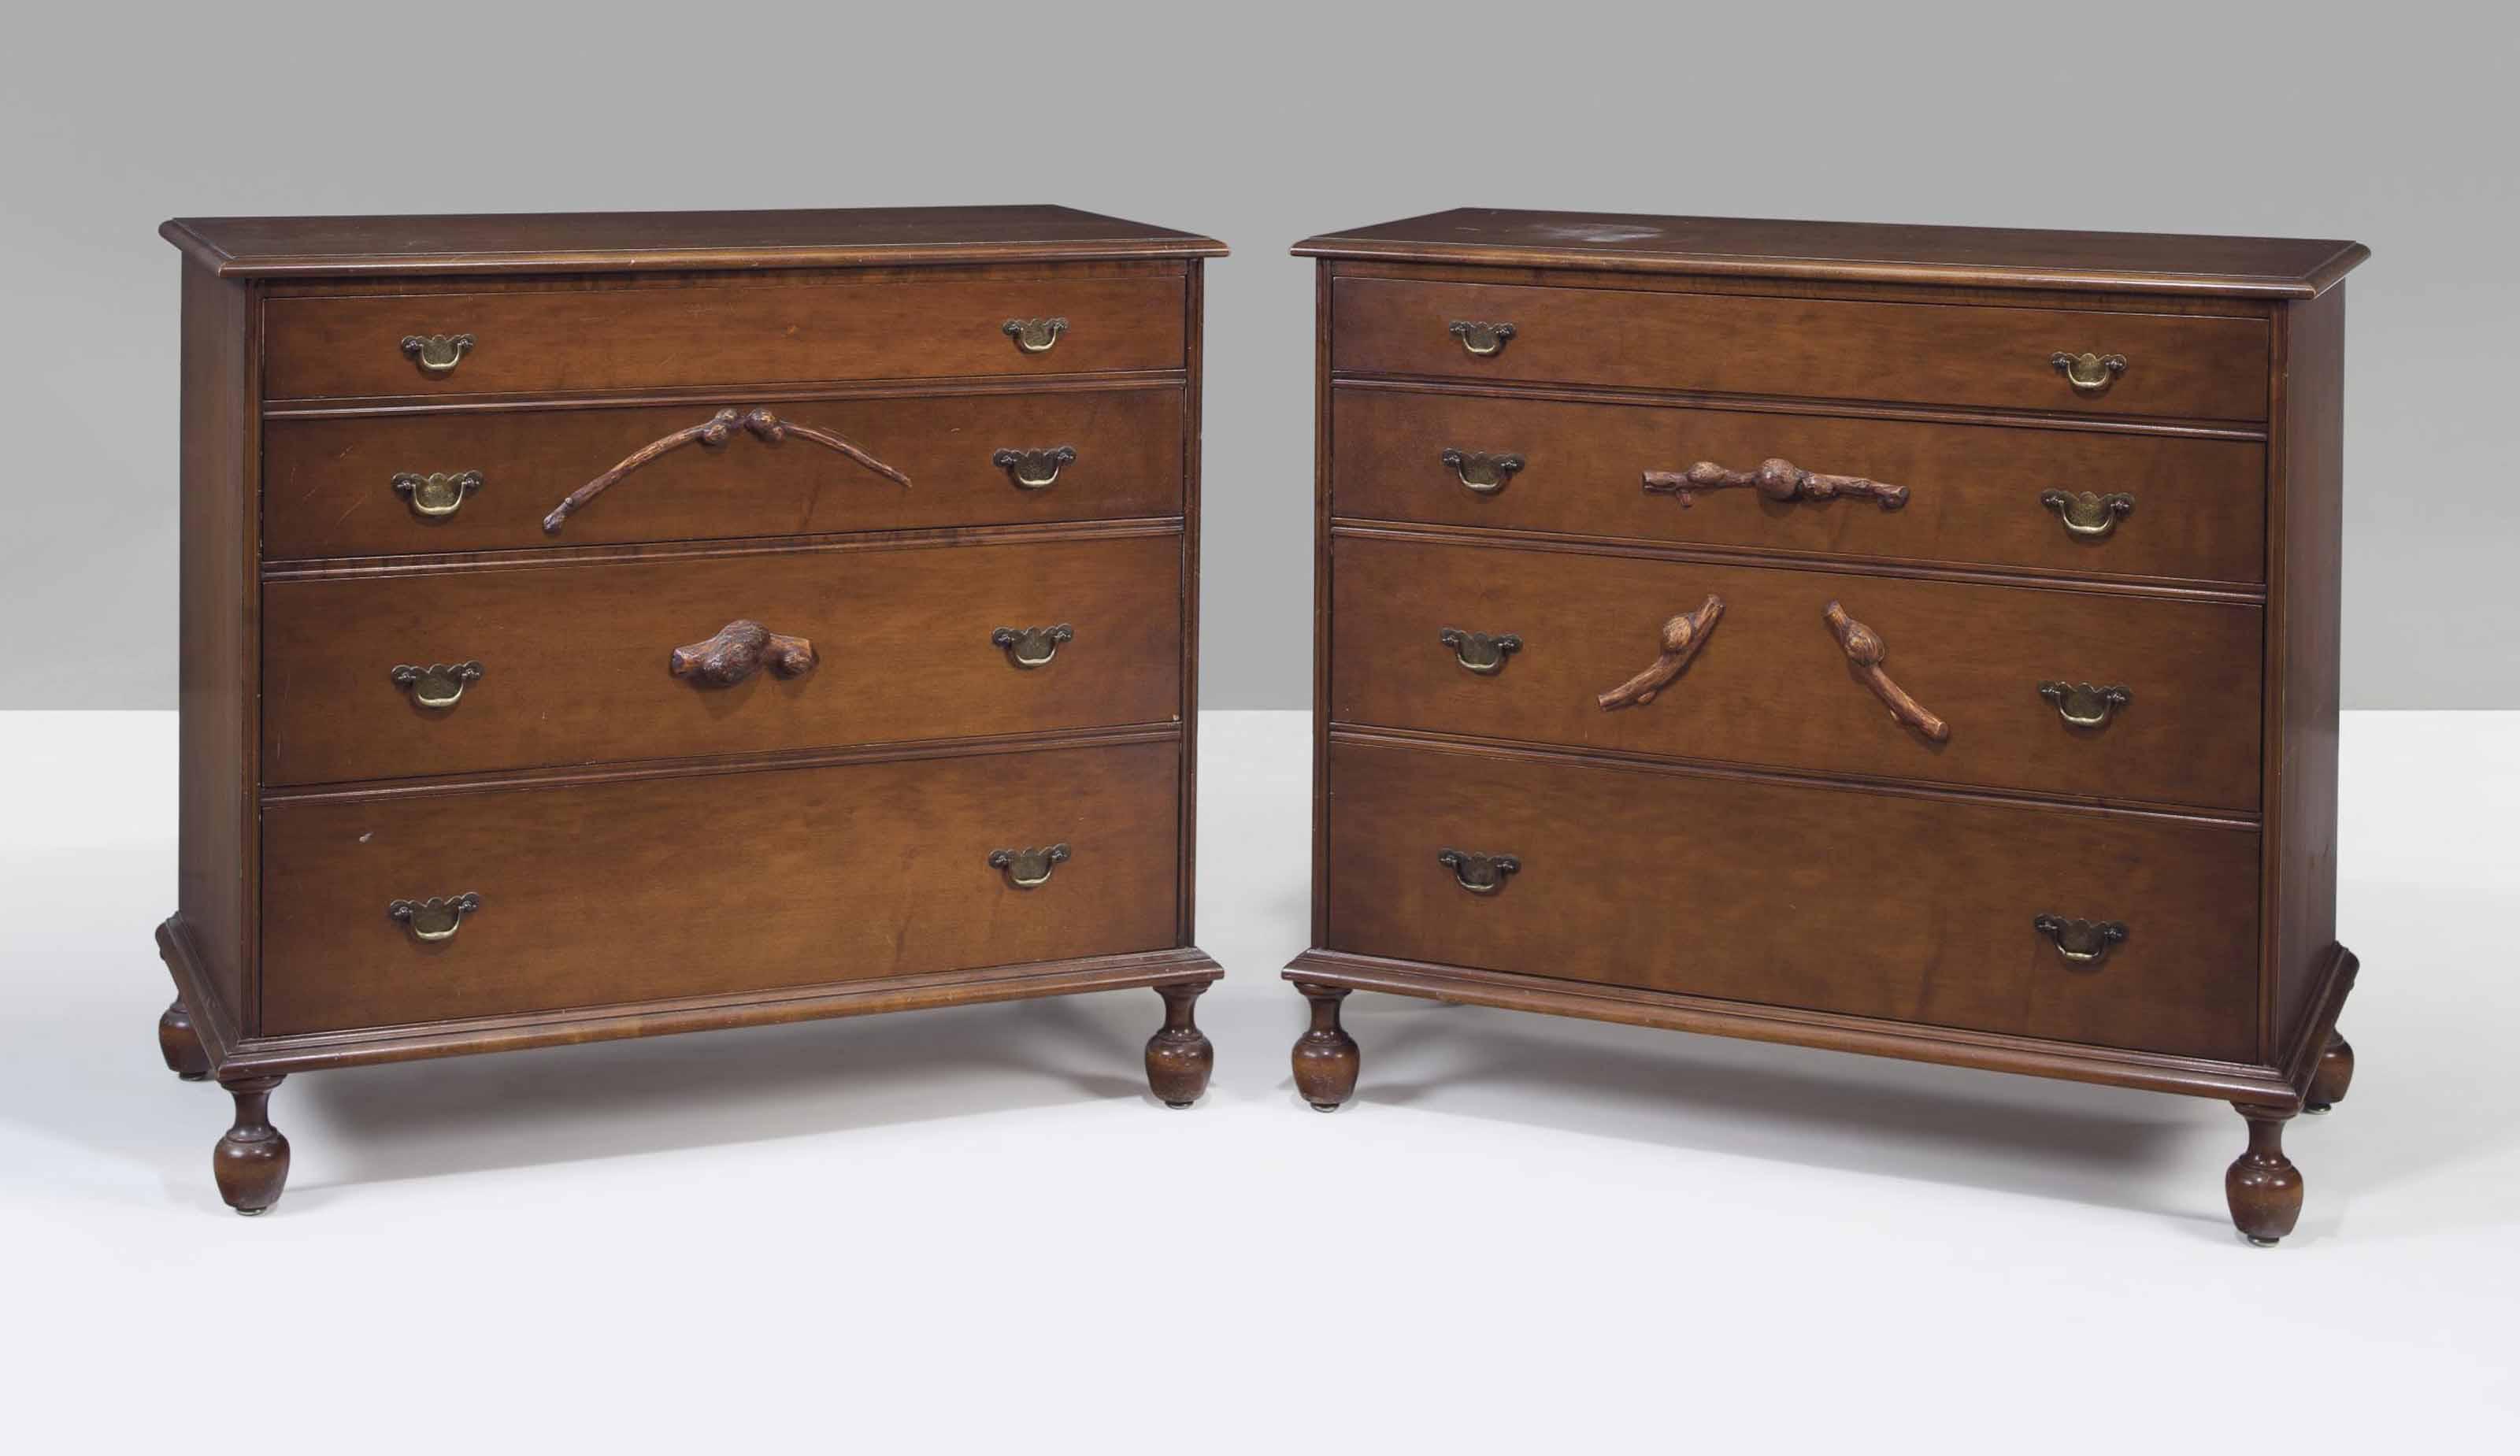 Landstrom Furniture 1879 Furniture Designs